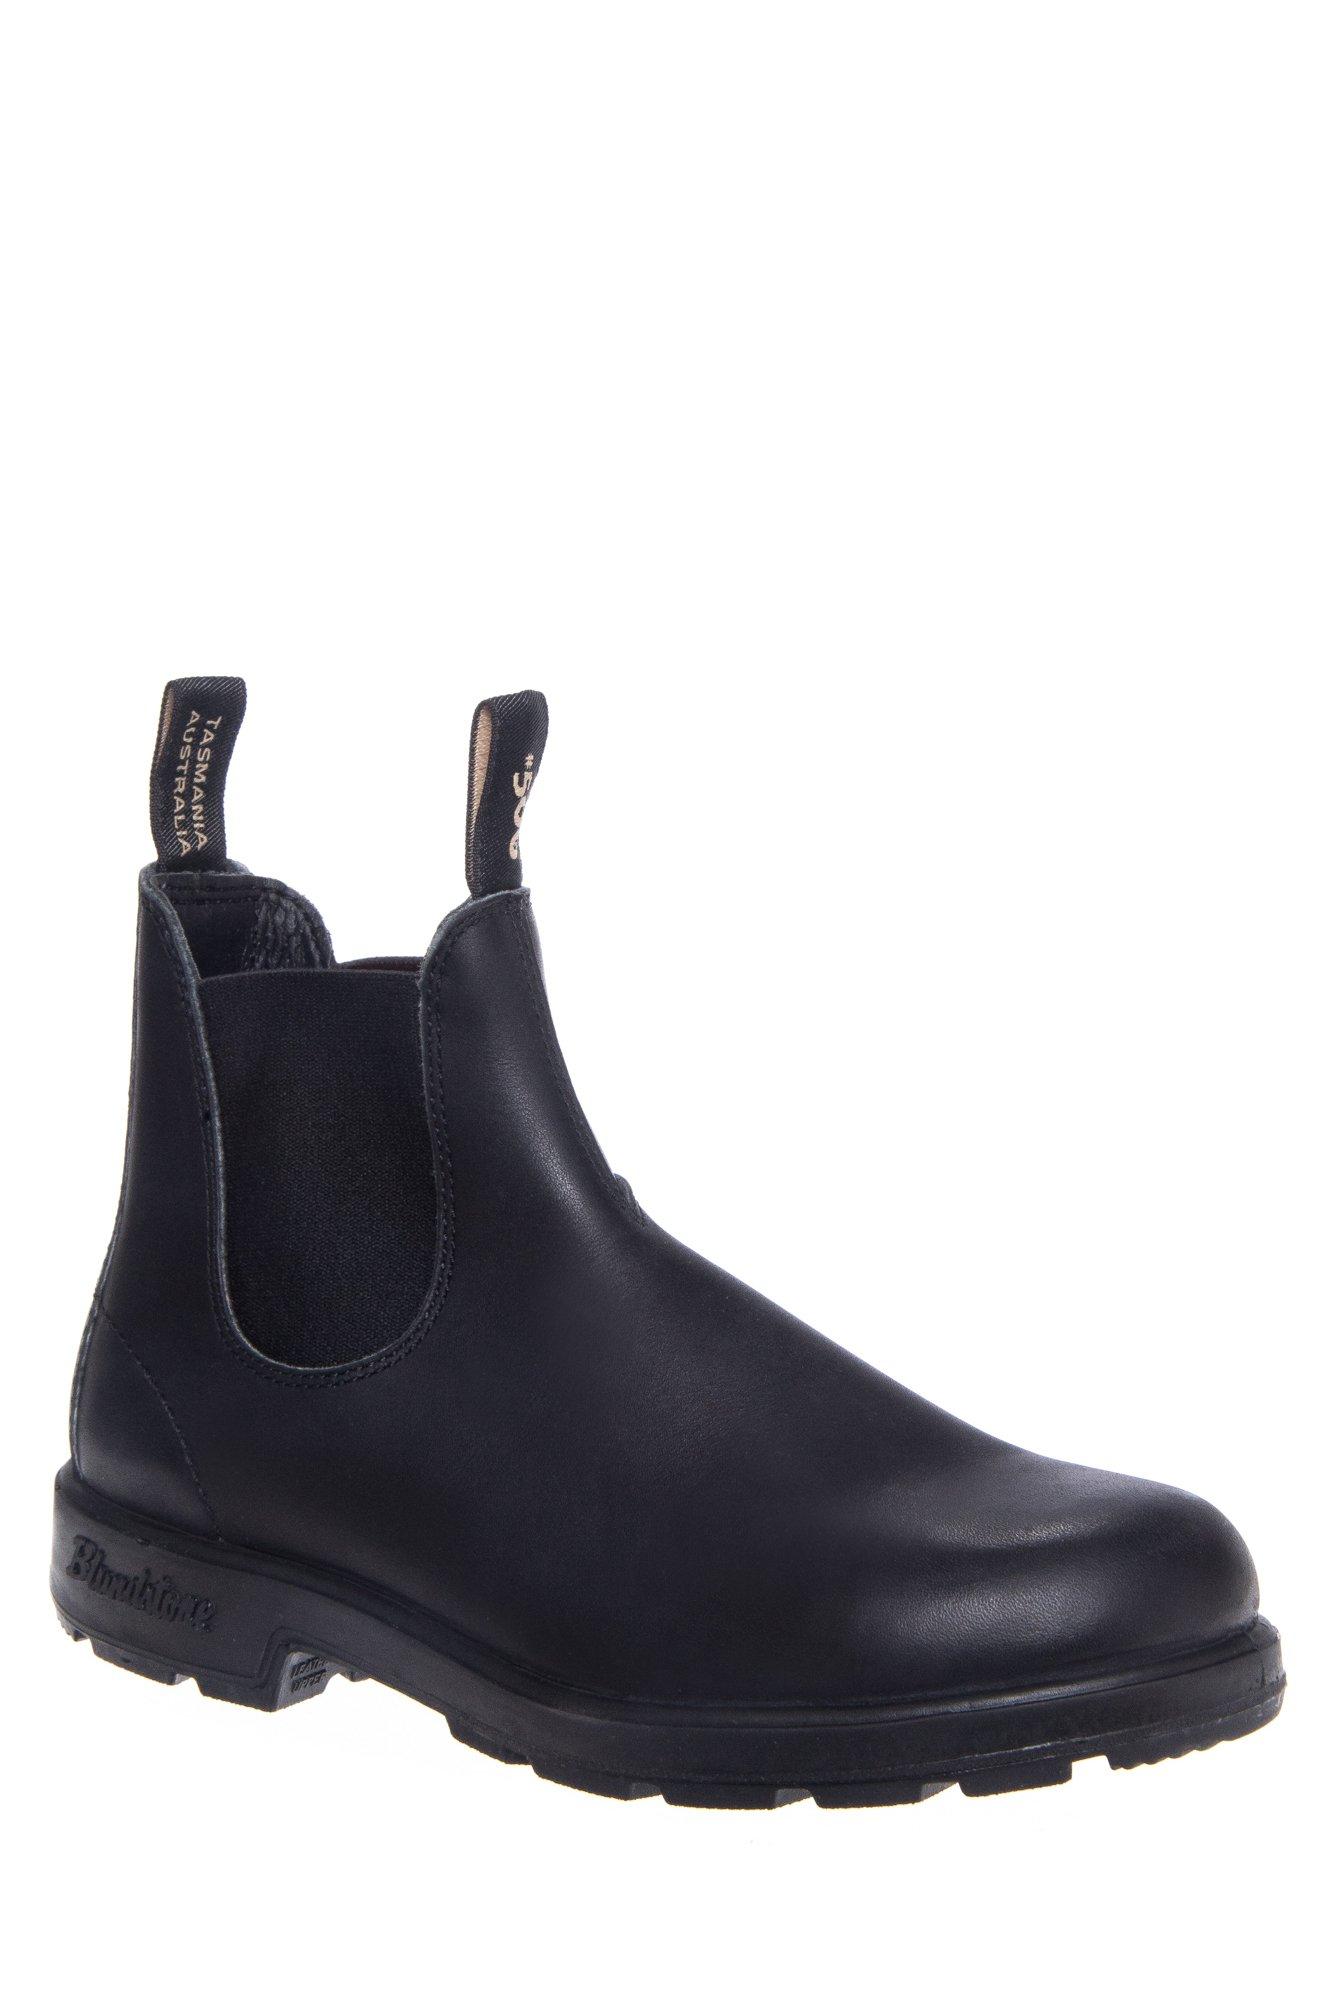 Blundstone Unisex The Original Pull-On Boot Black 6.5 M UK